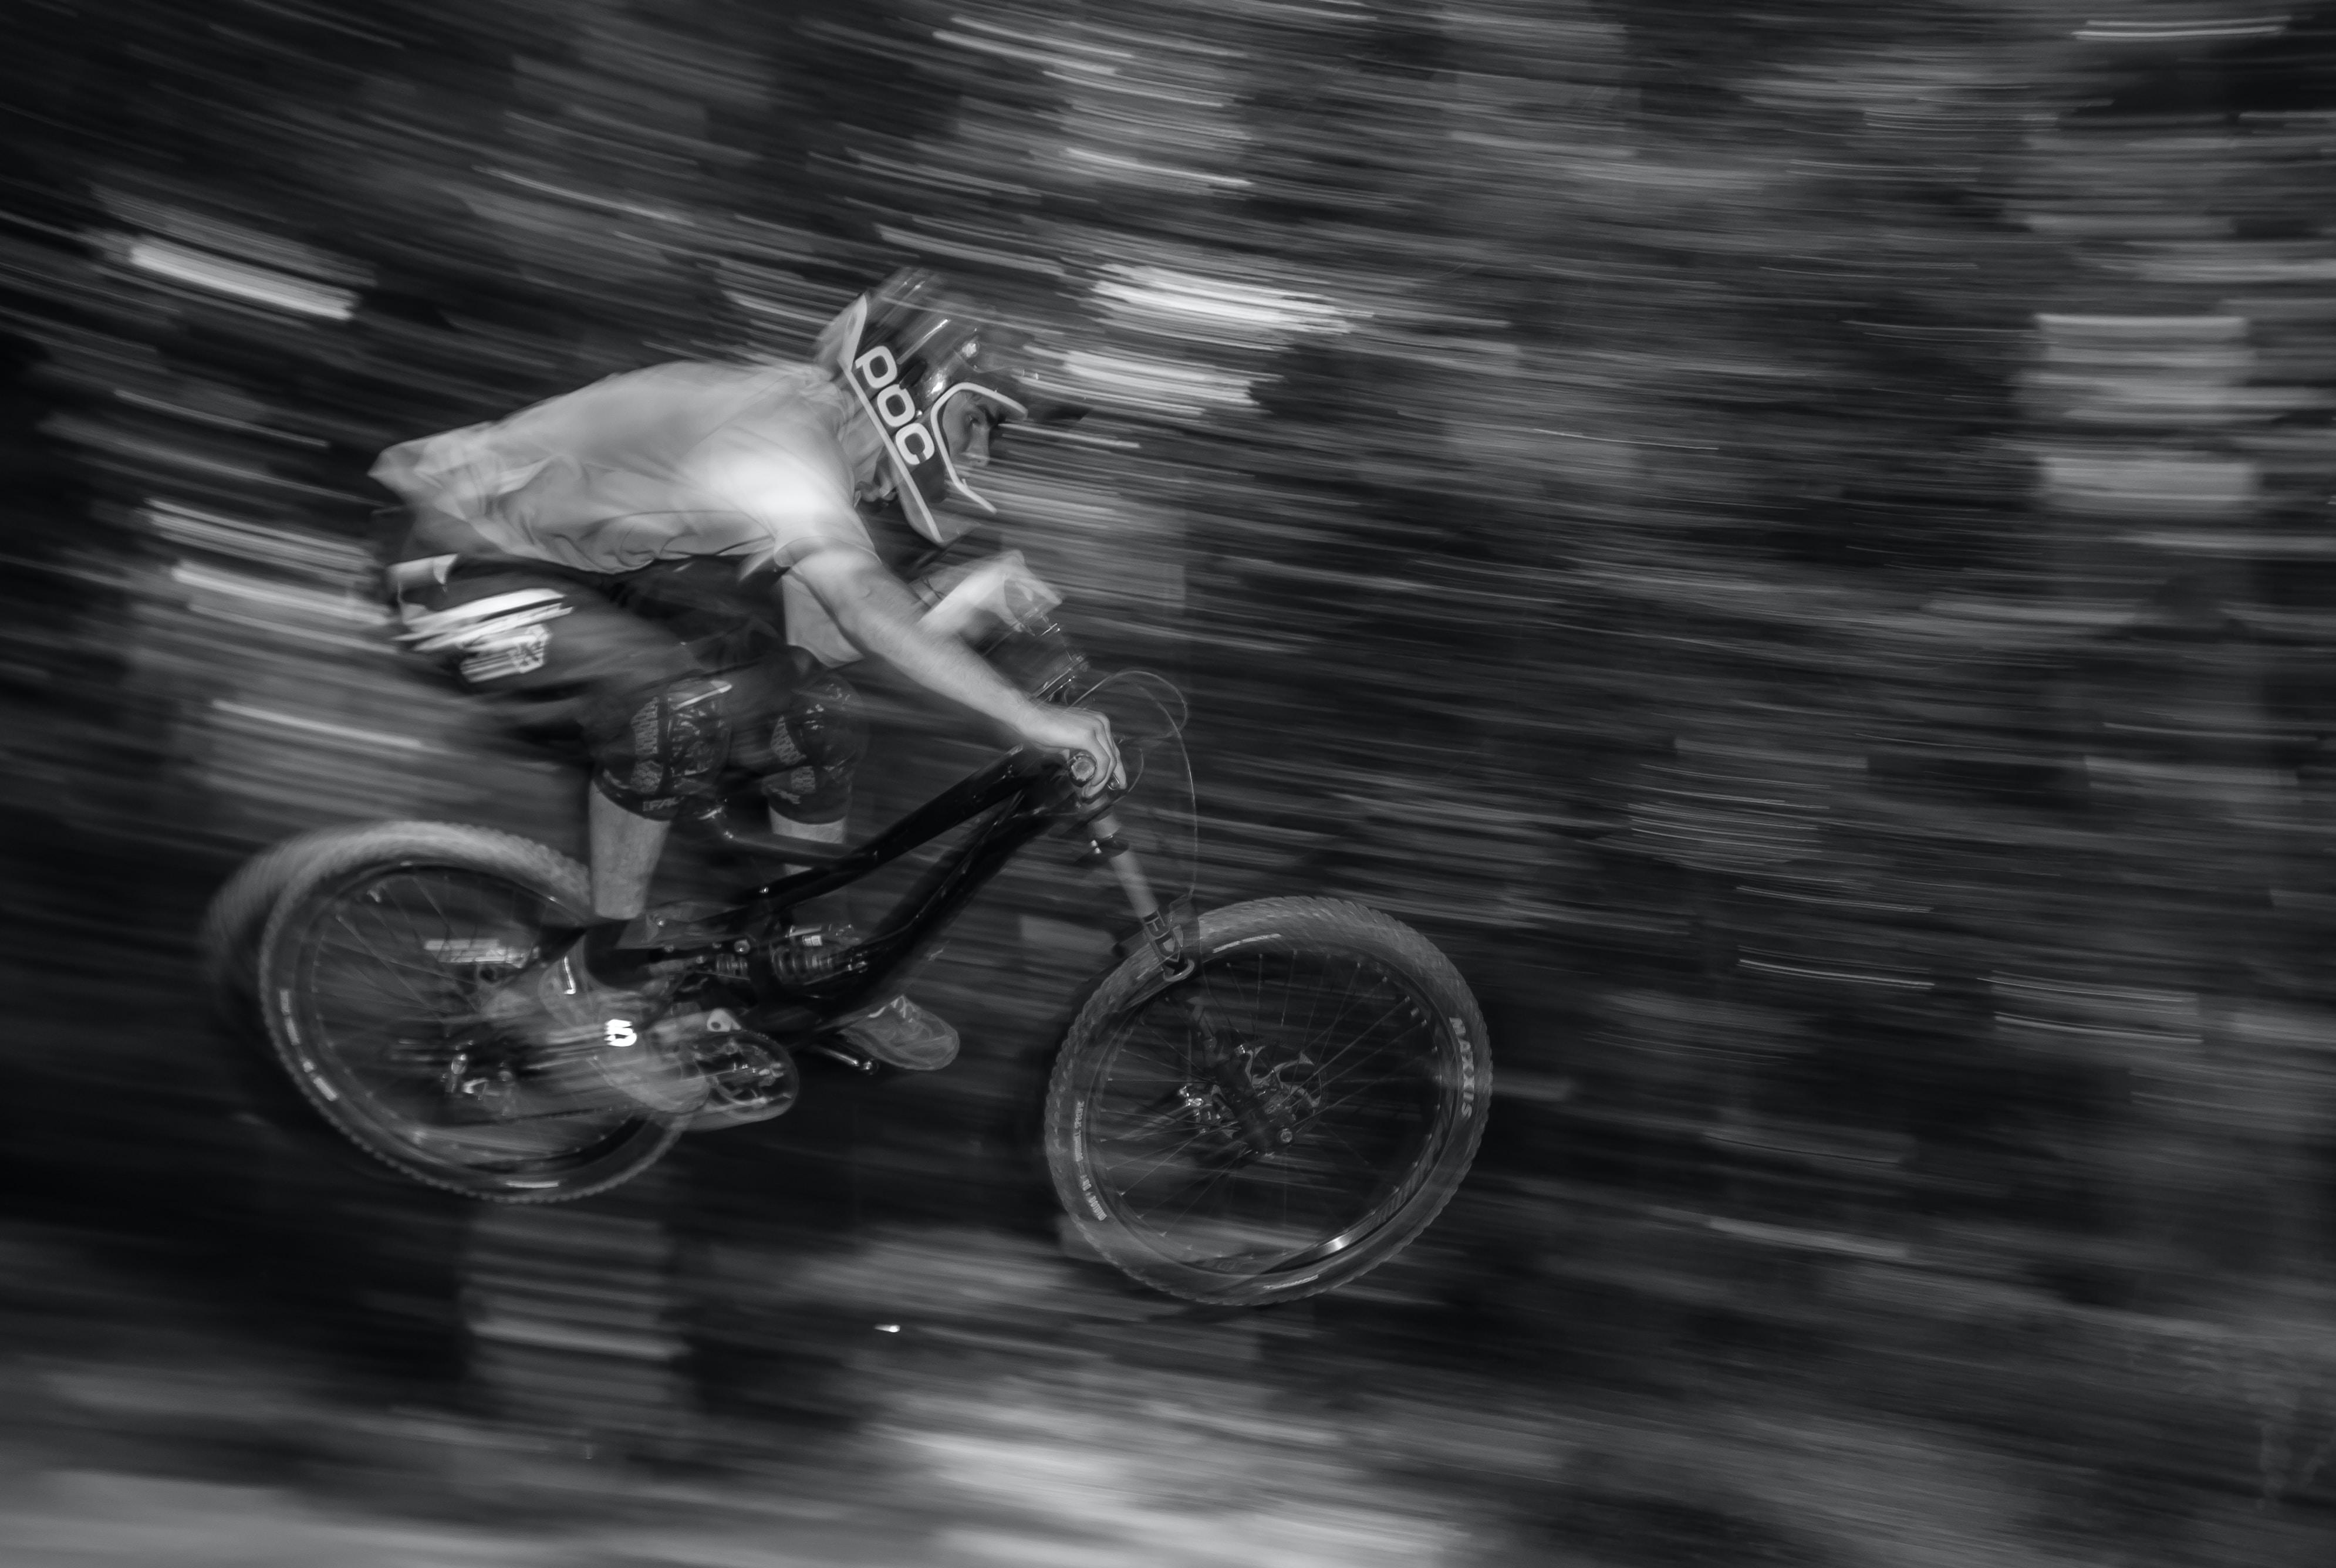 panning photography of man on bike doing stunts